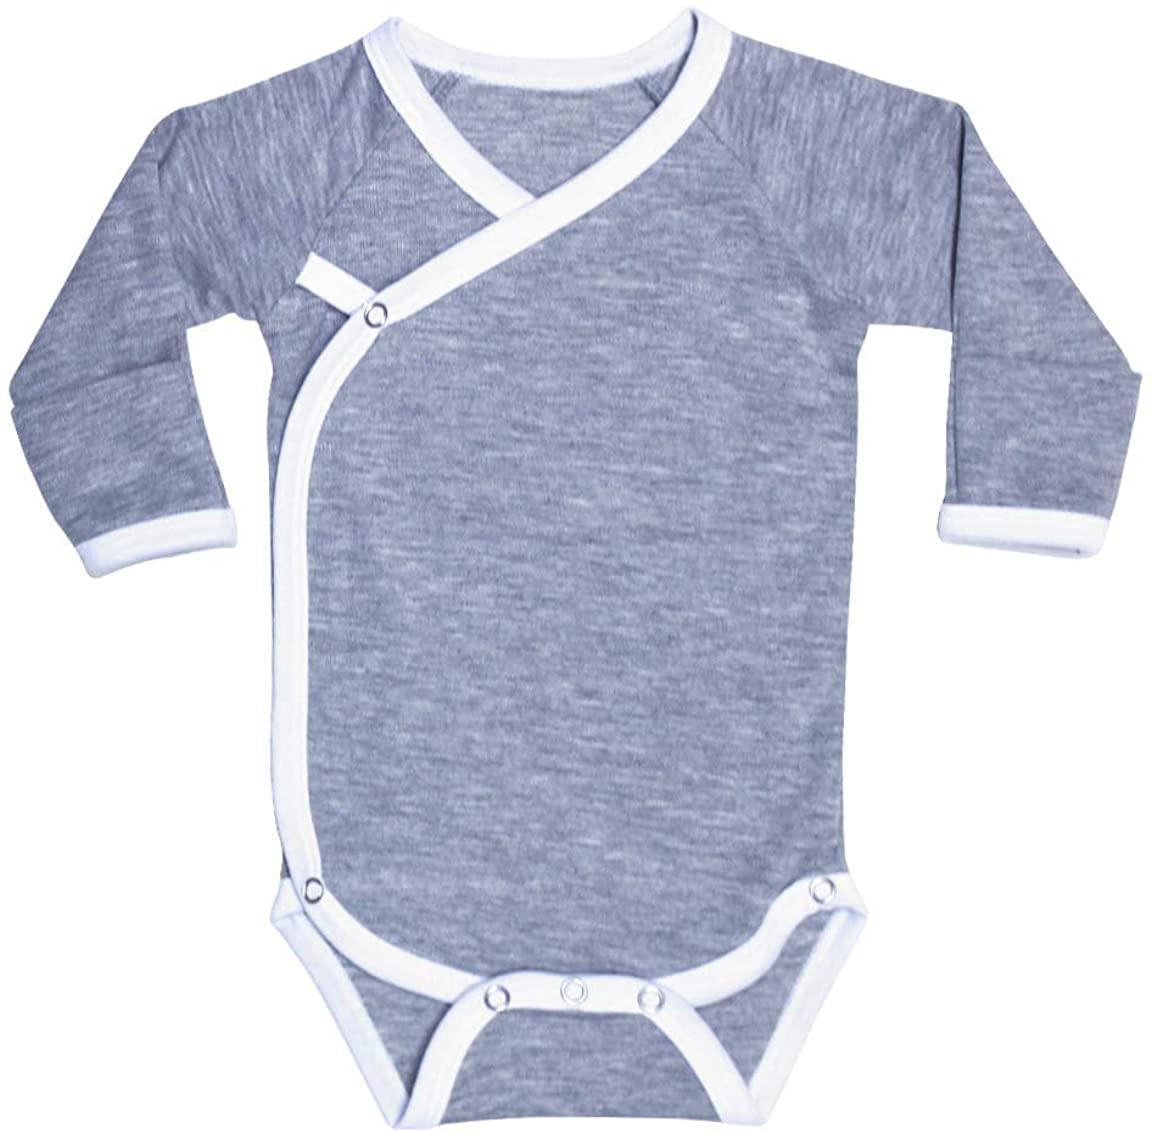 Laughing Giraffe Newborn Baby Ringer Kimono Side-Snap Romper Onesie Bodysuit with Mitten Cuffs Gray/White